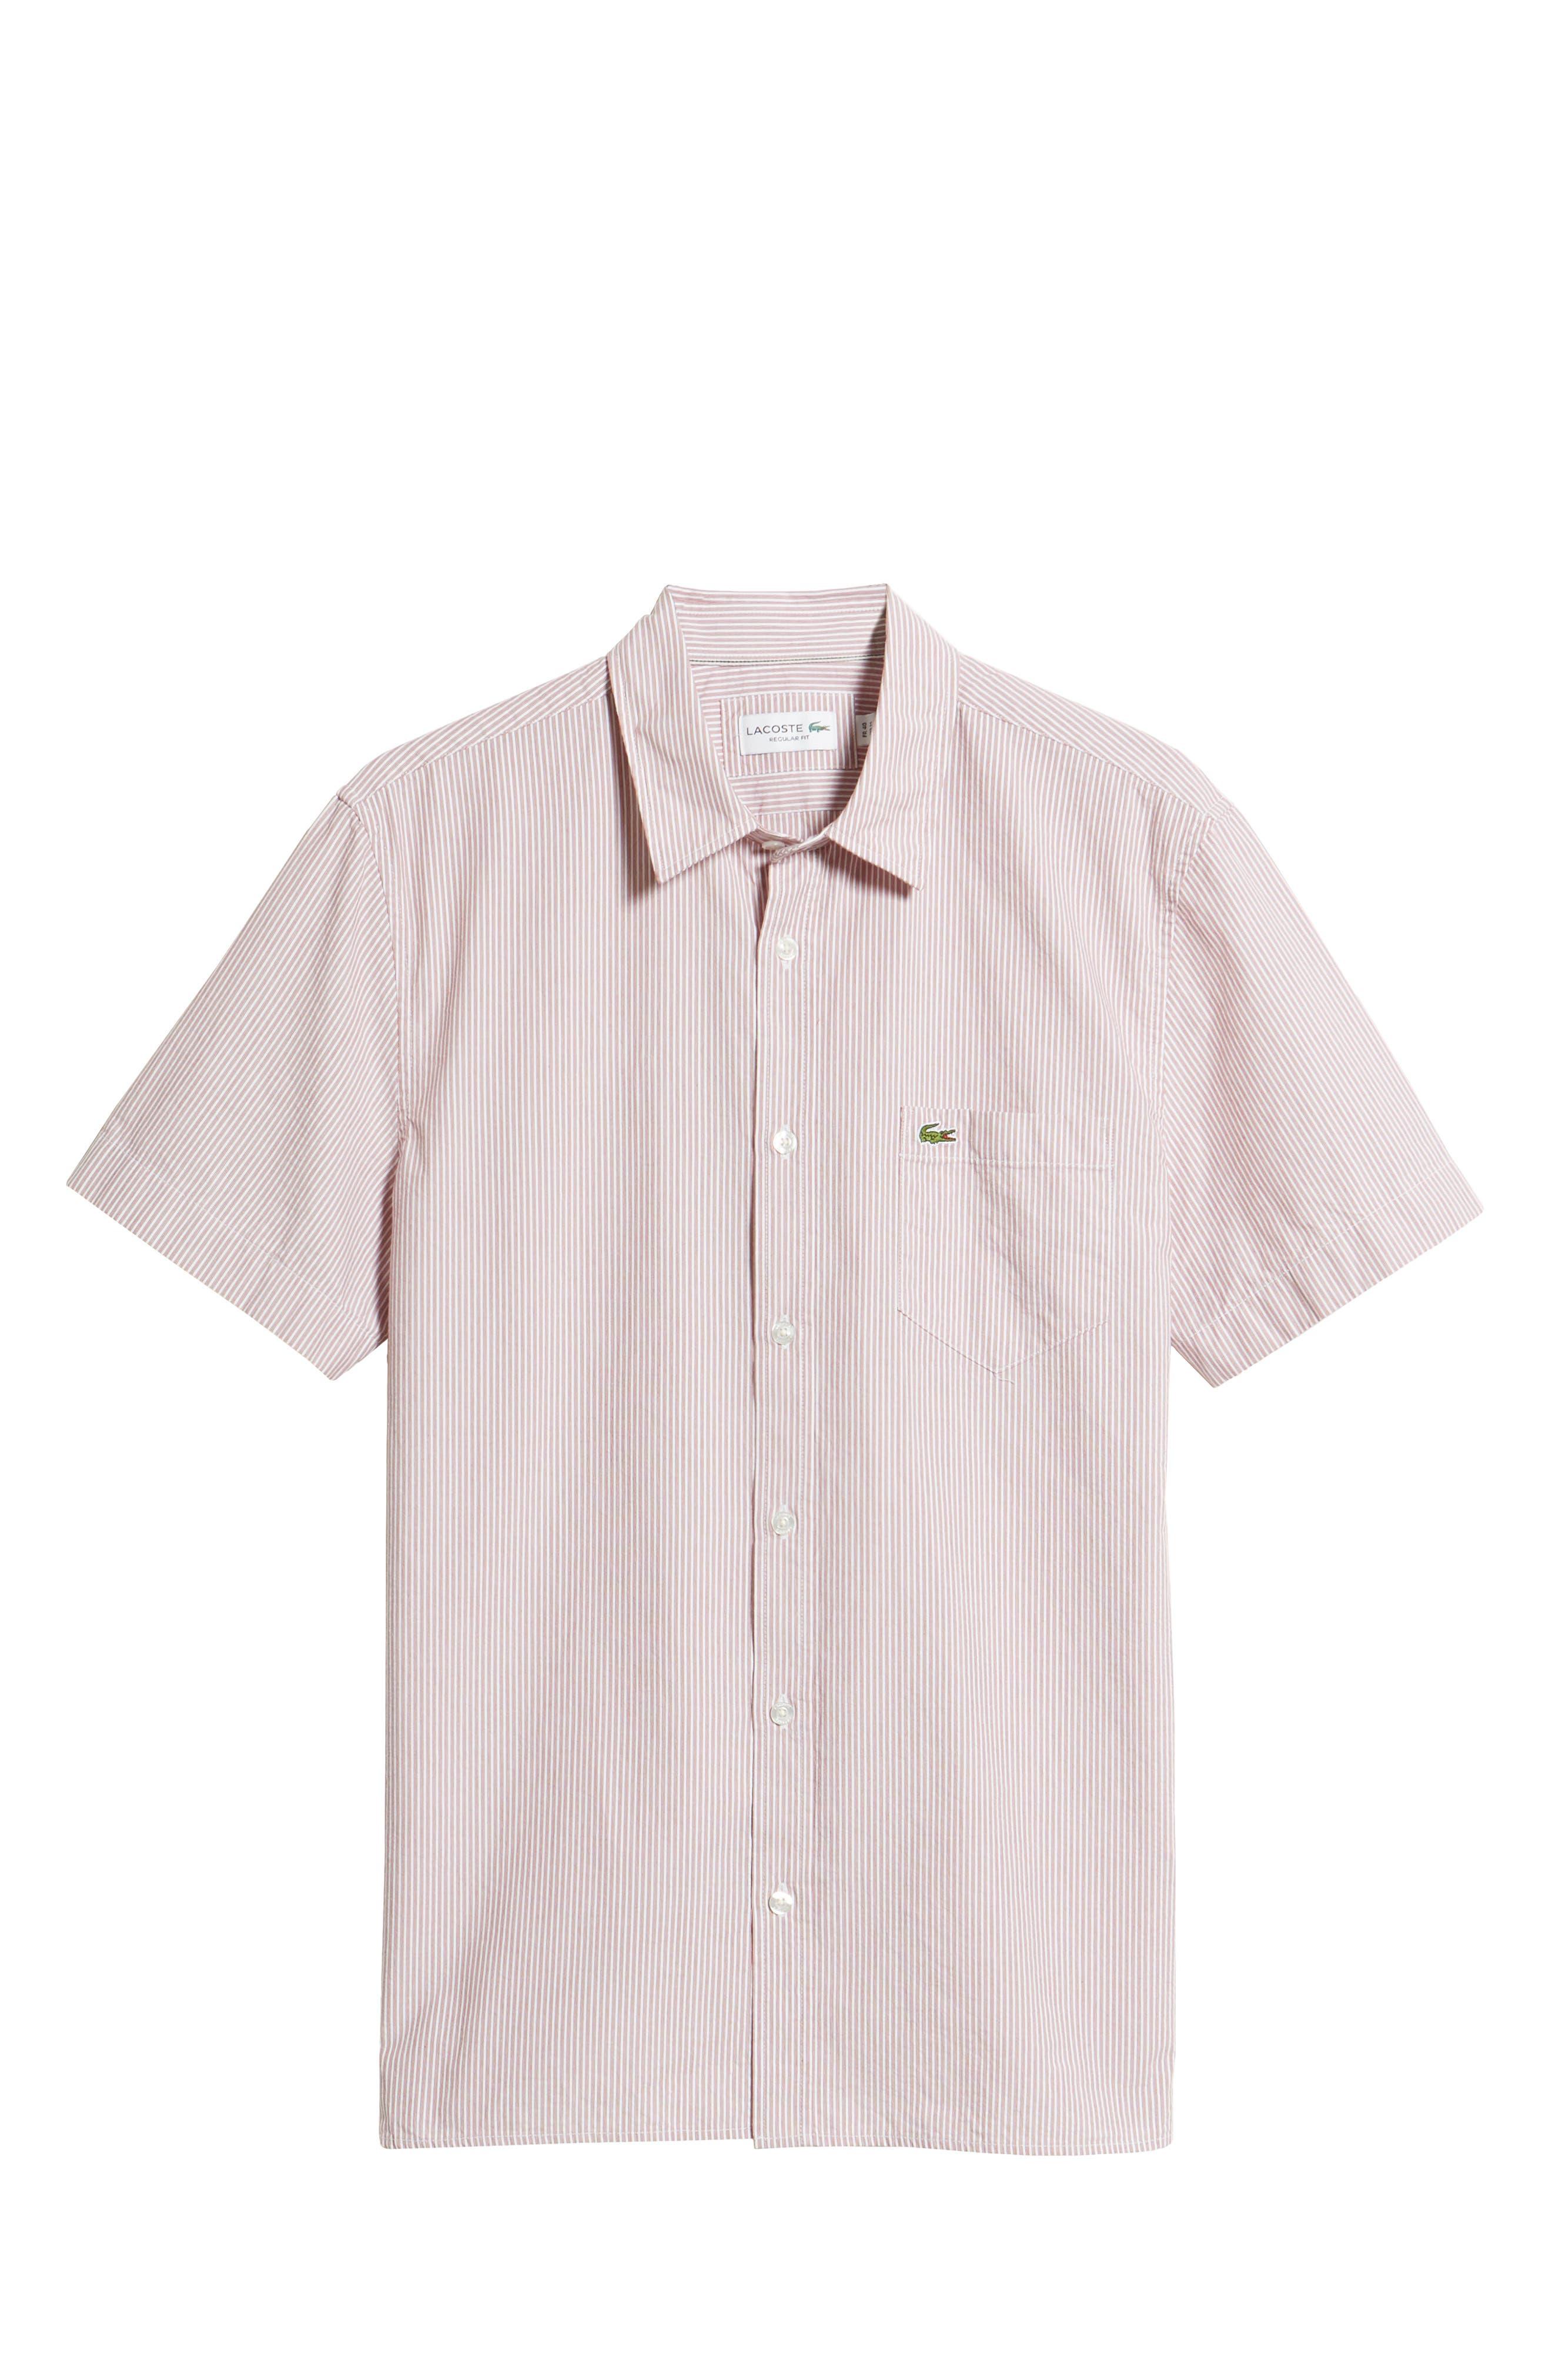 Regular Fit Seersucker Sport Shirt,                             Alternate thumbnail 6, color,                             TOREADOR